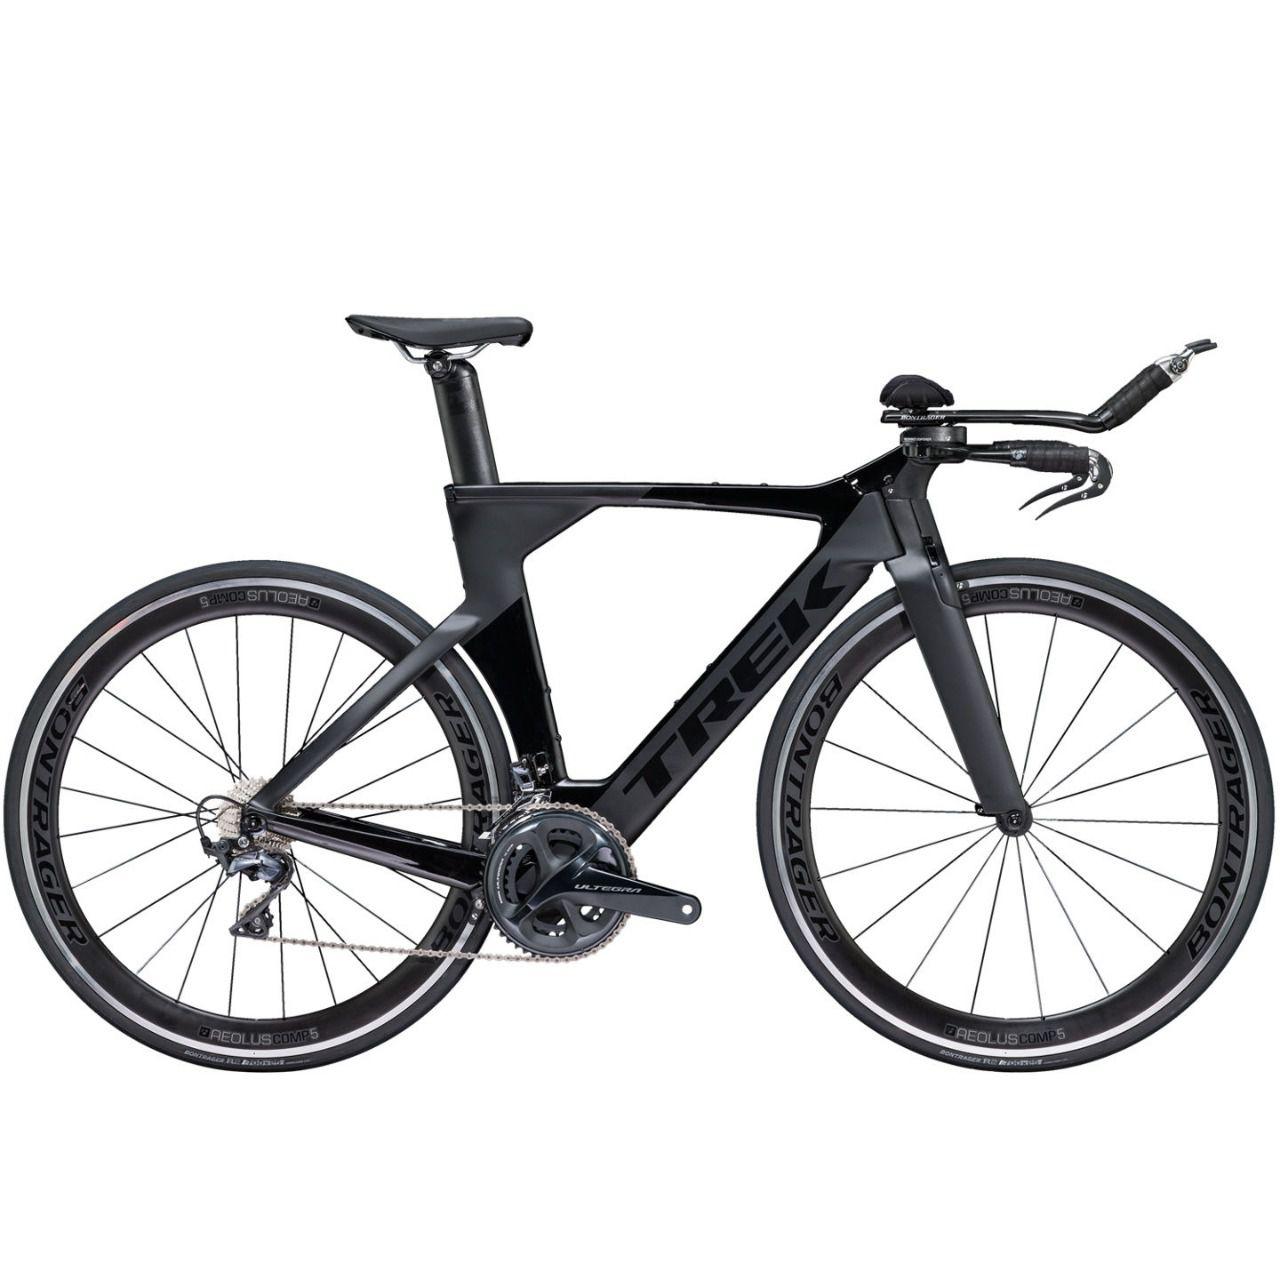 Bicicleta Trek Speed Concept - TAMANHO 54 R$29.999,00